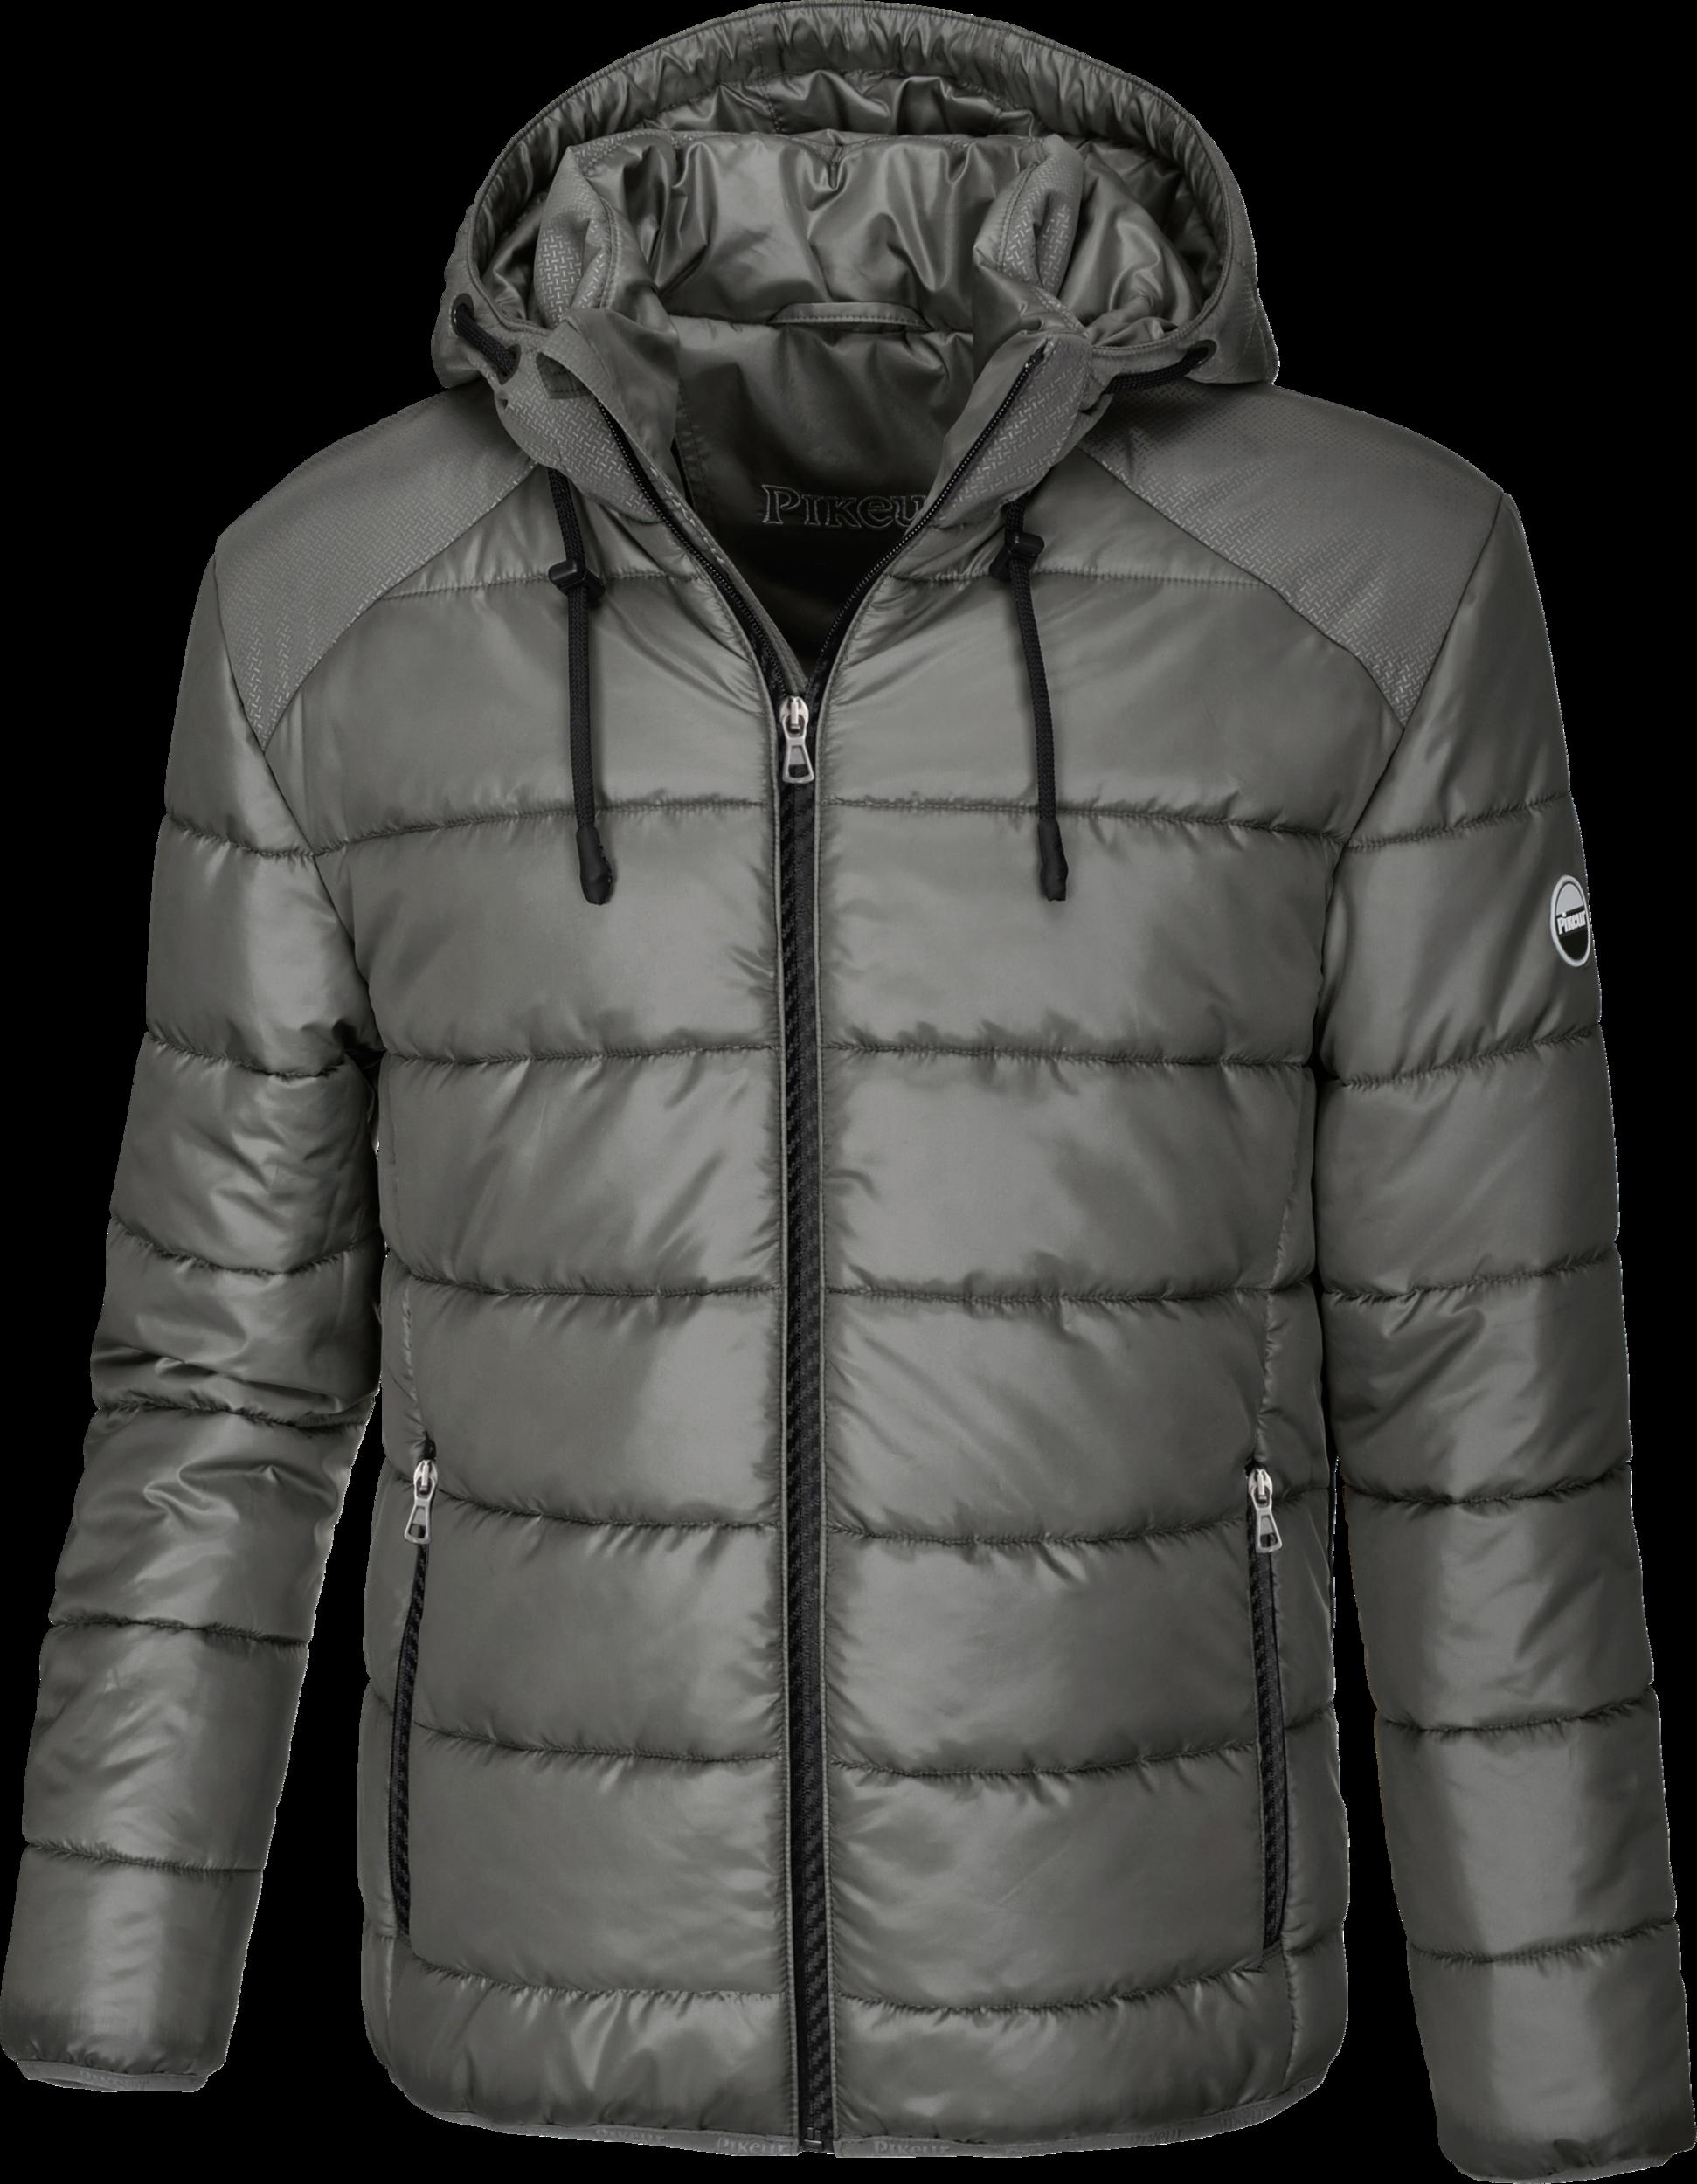 NANDOR Jacket